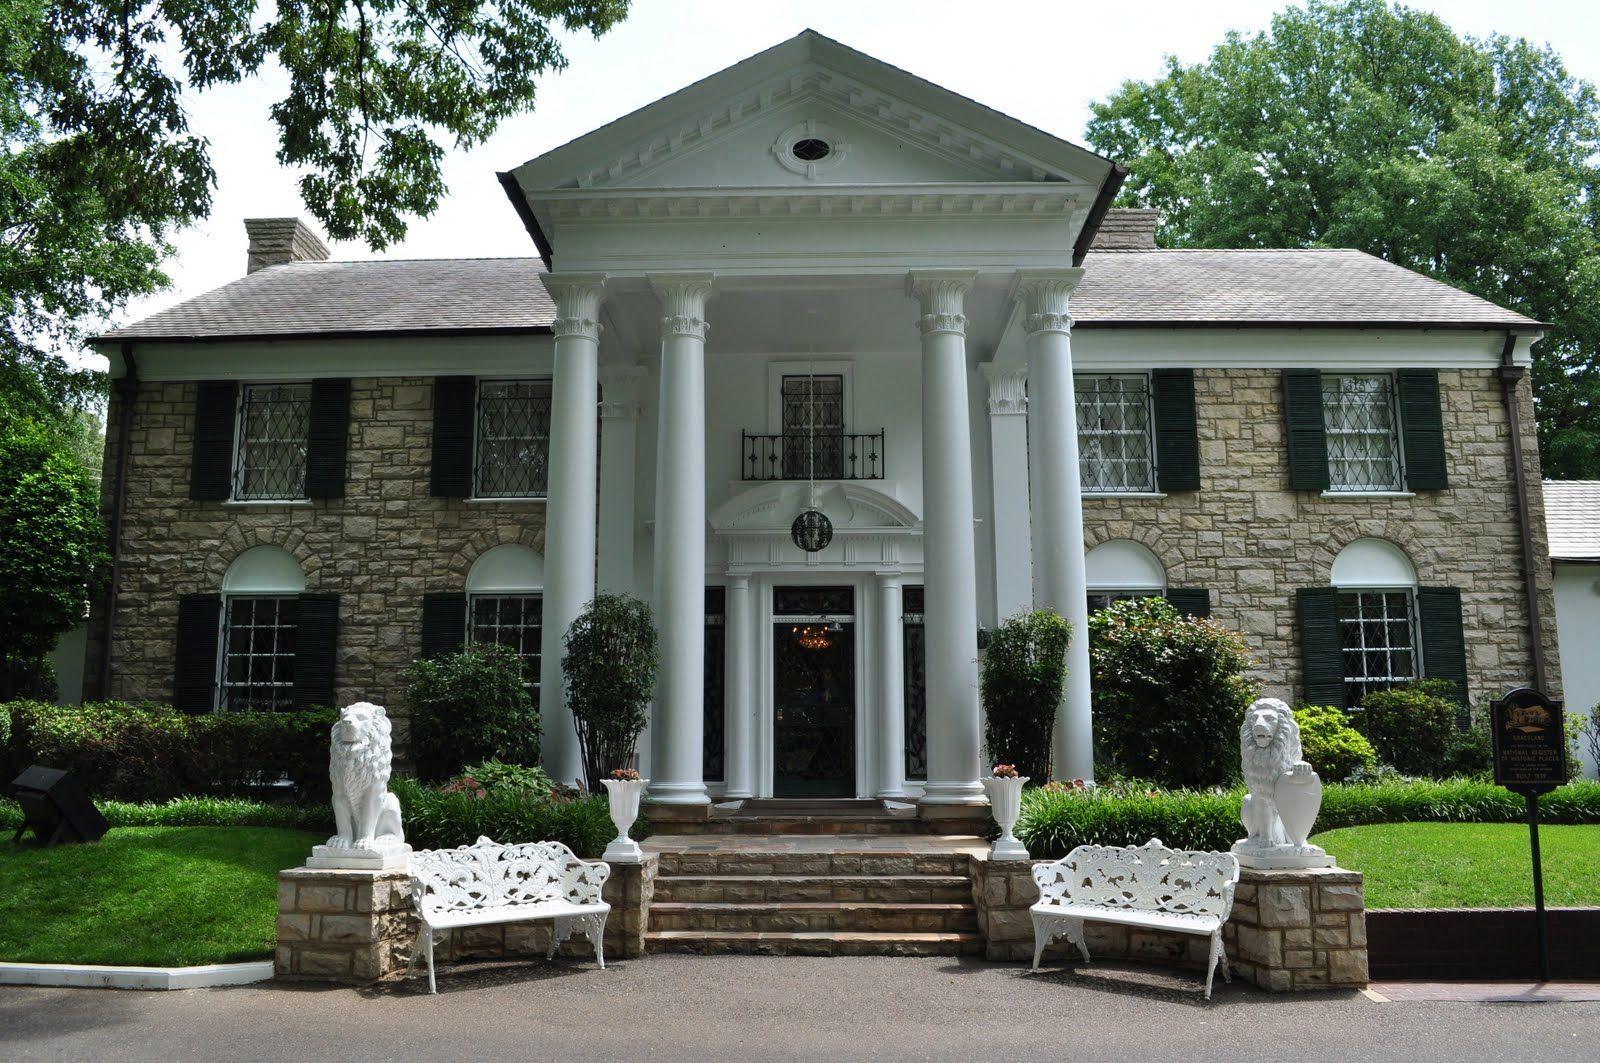 Graceland in memphis tennessee home of elvis presley for Hotels near graceland memphis tn